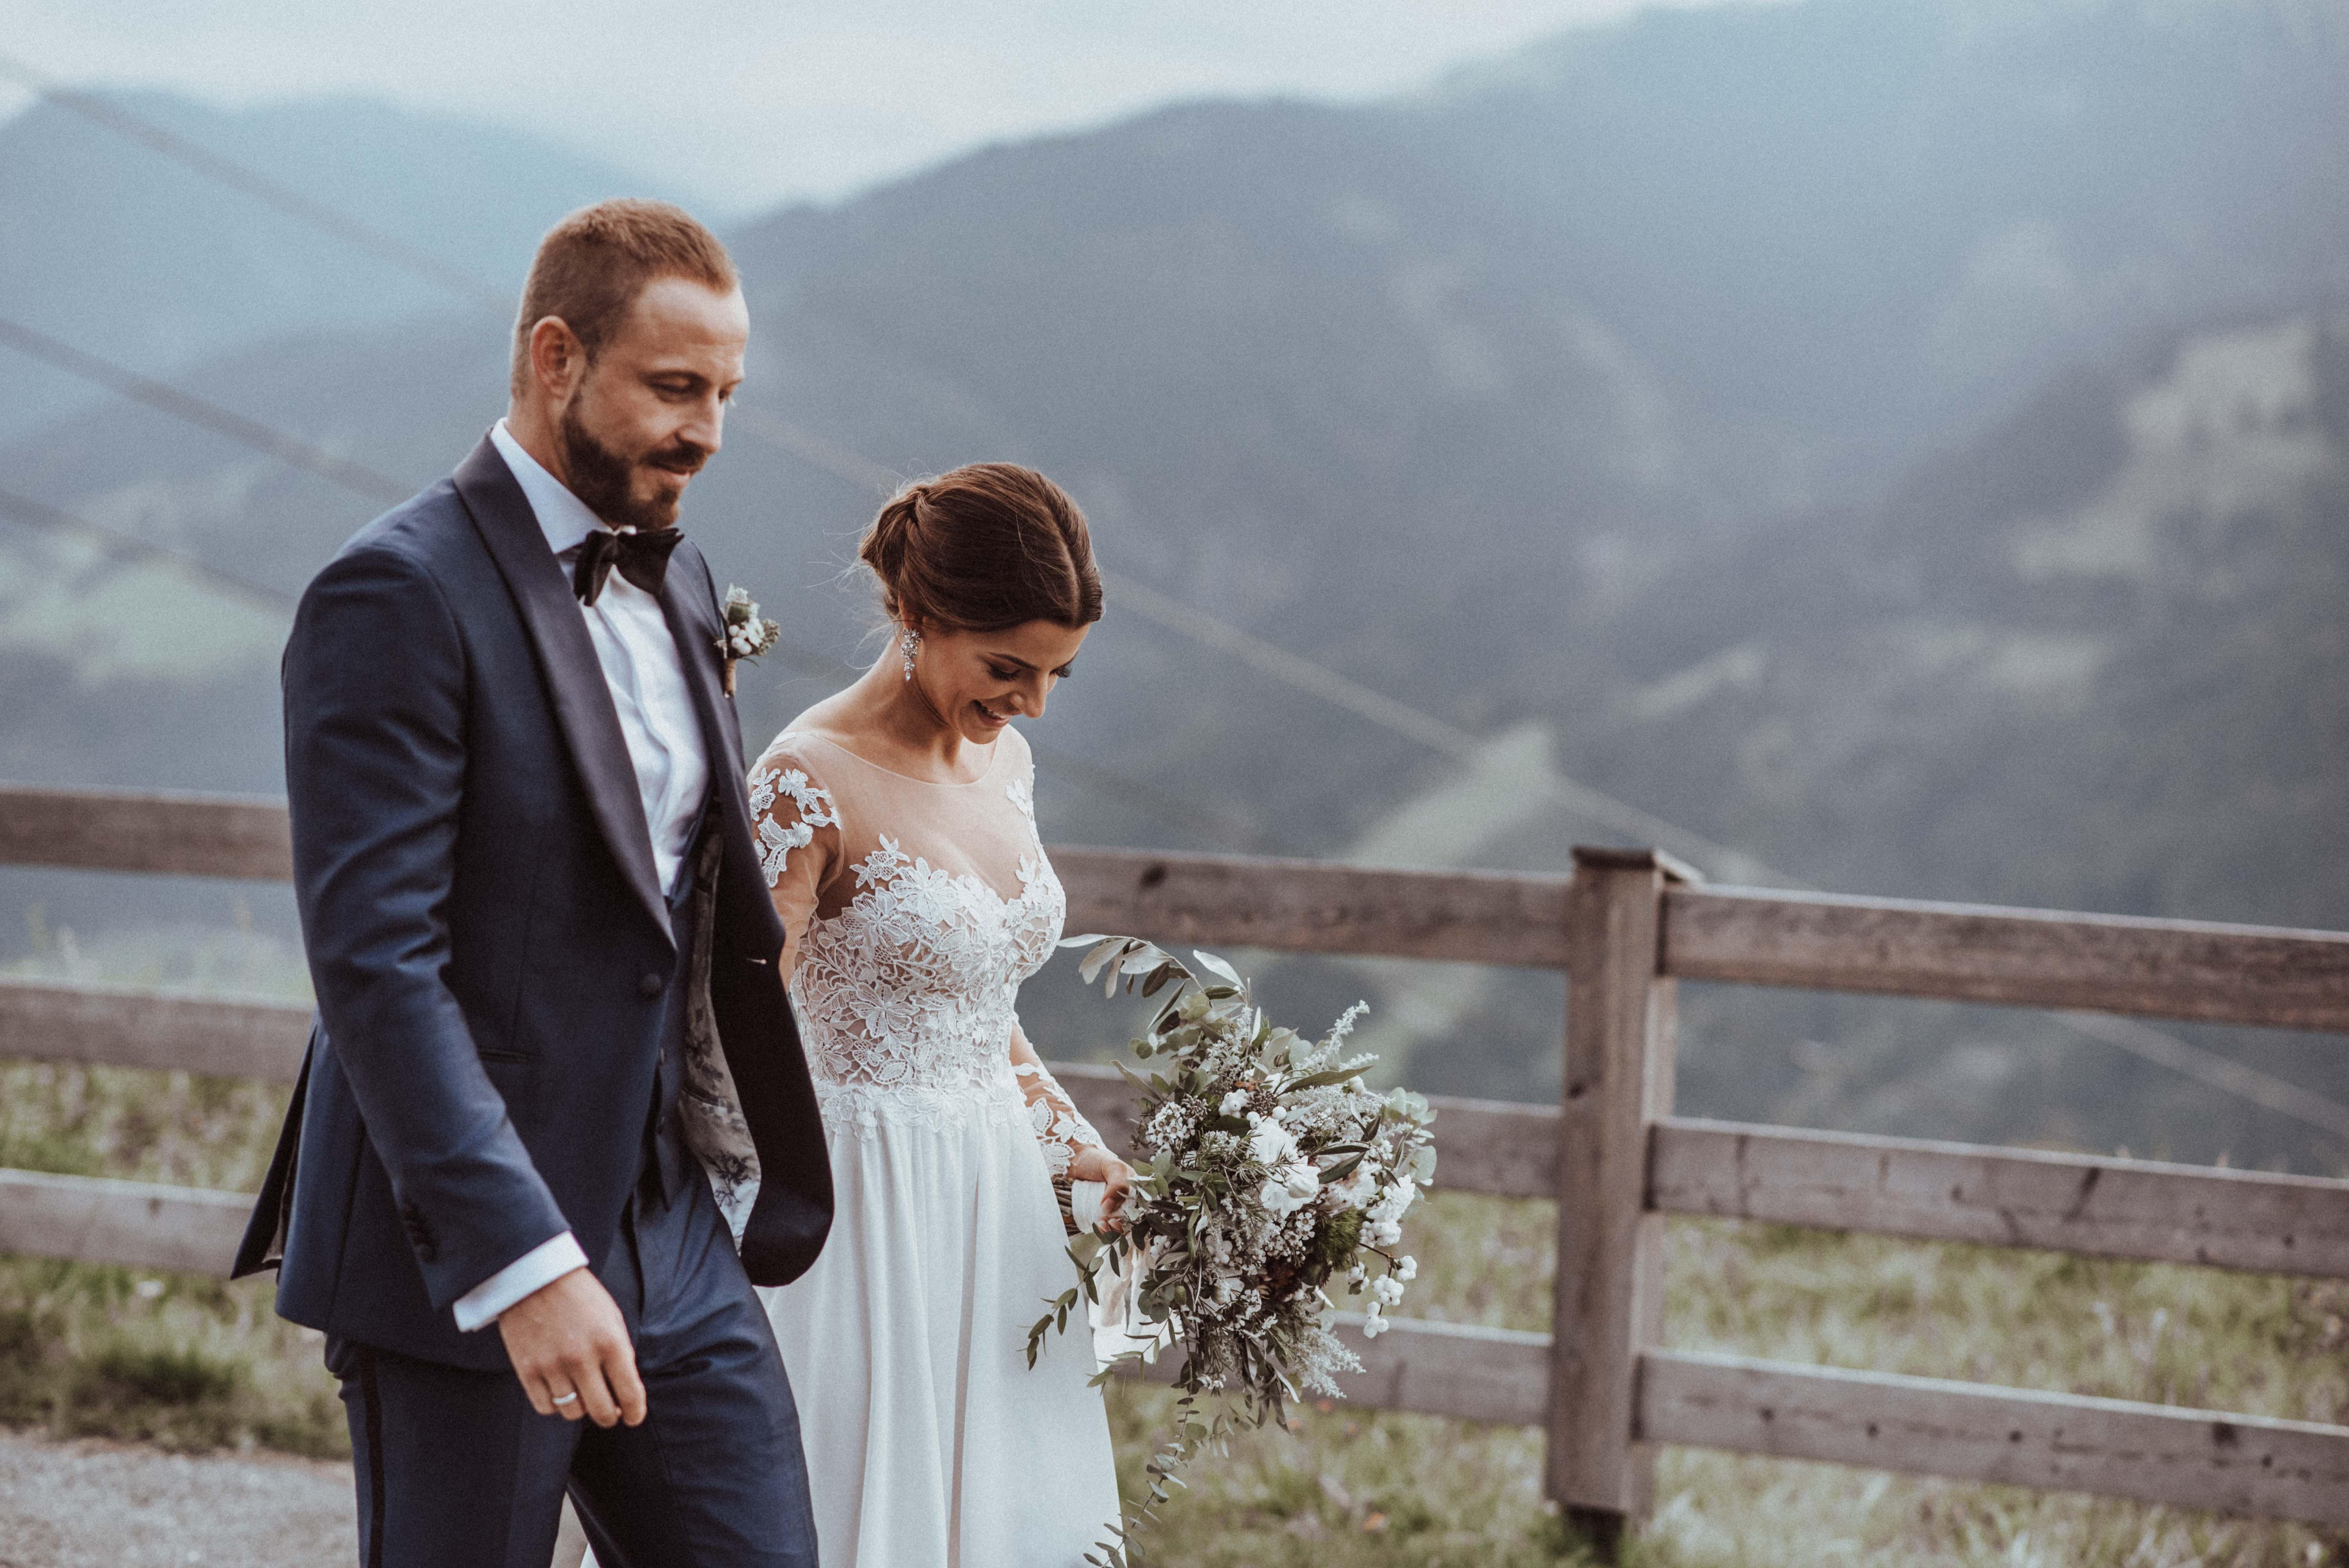 coupleshoot zweisamkeit Sonja Pöhlmann Photography Wedding München Bayern